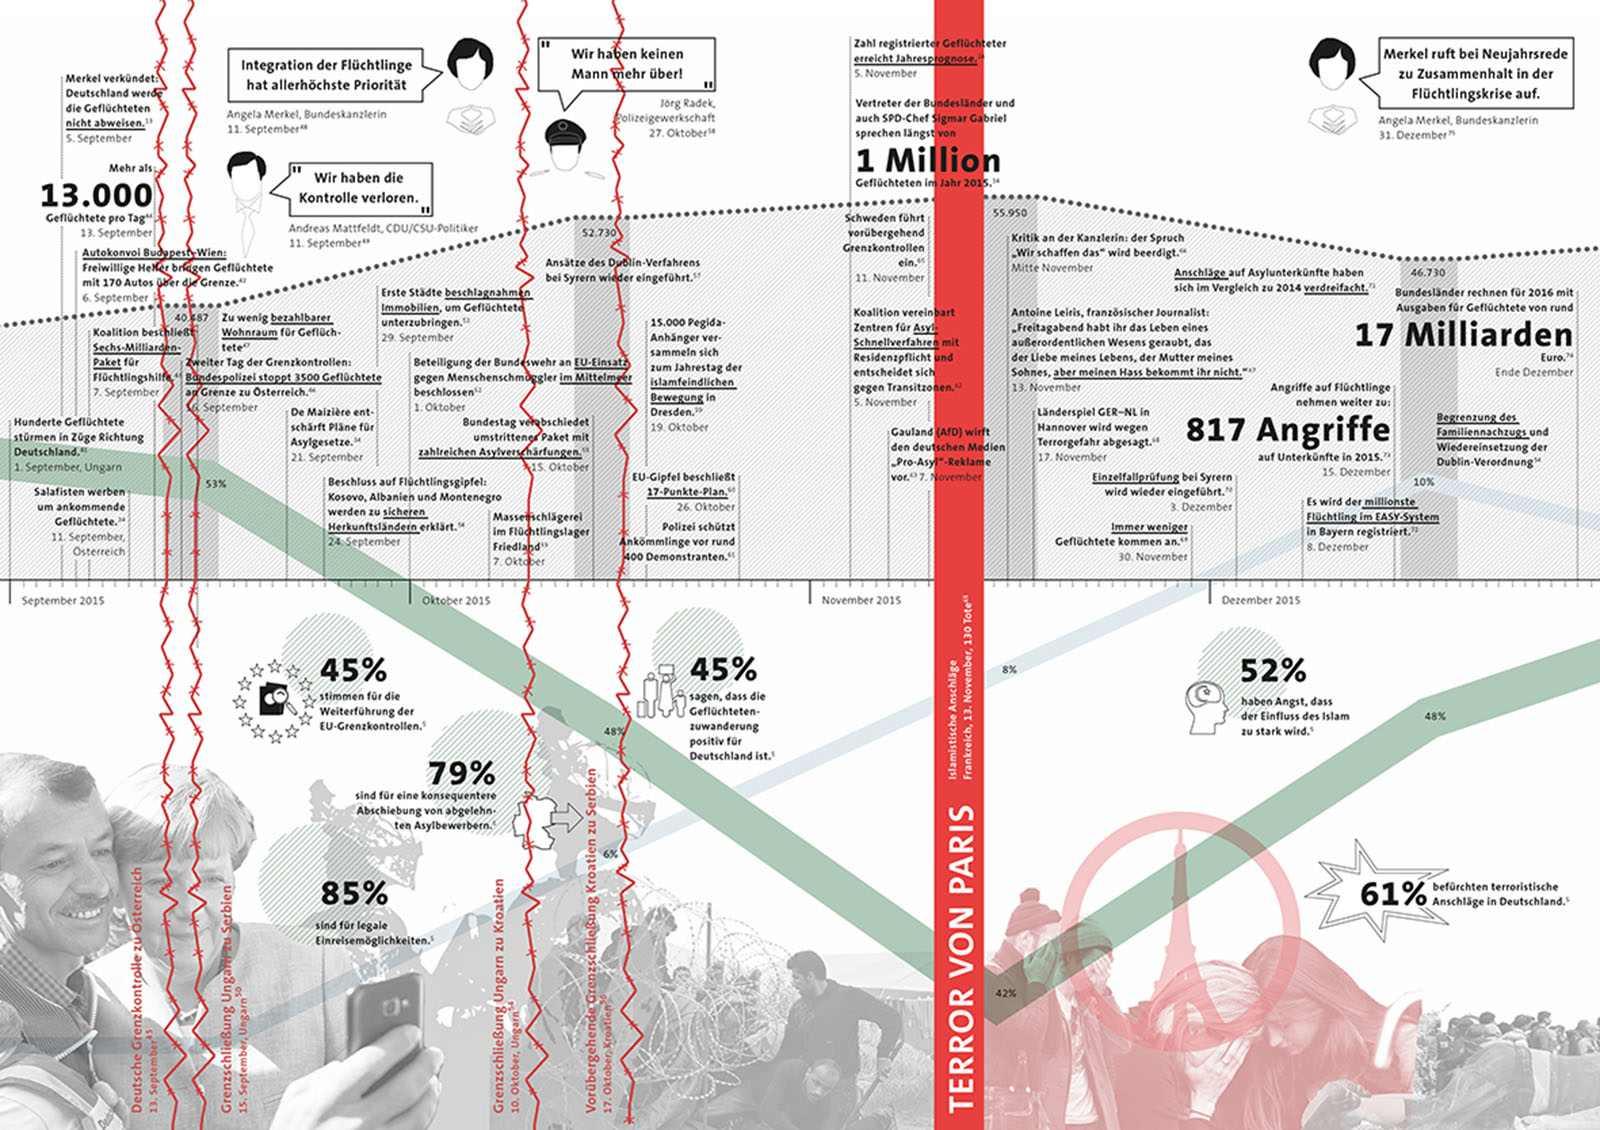 Diagram.  Jüngste Entwicklungen in der Flüchtlingskrise